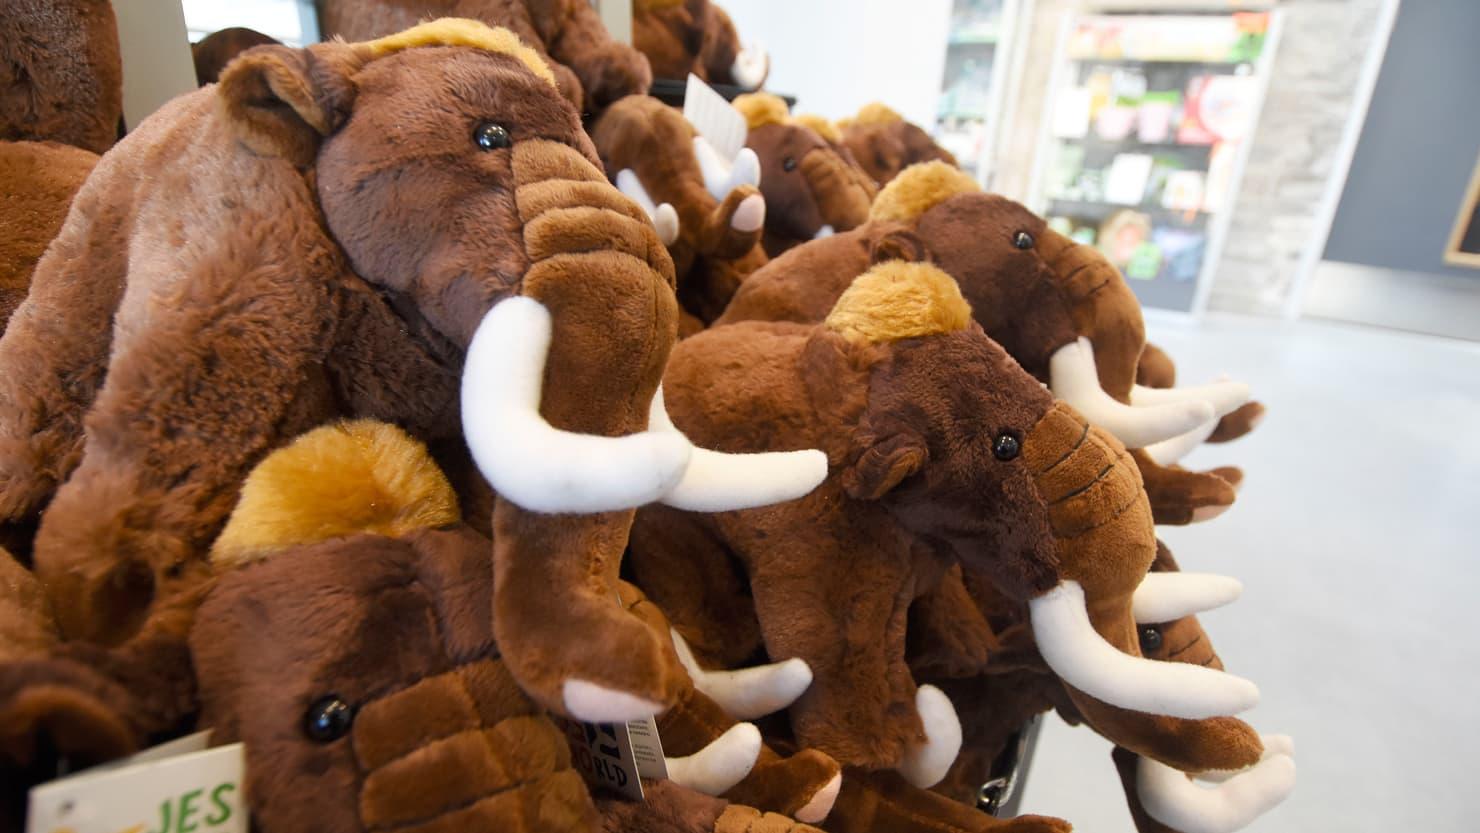 Cuddly mammoth toys in a shop